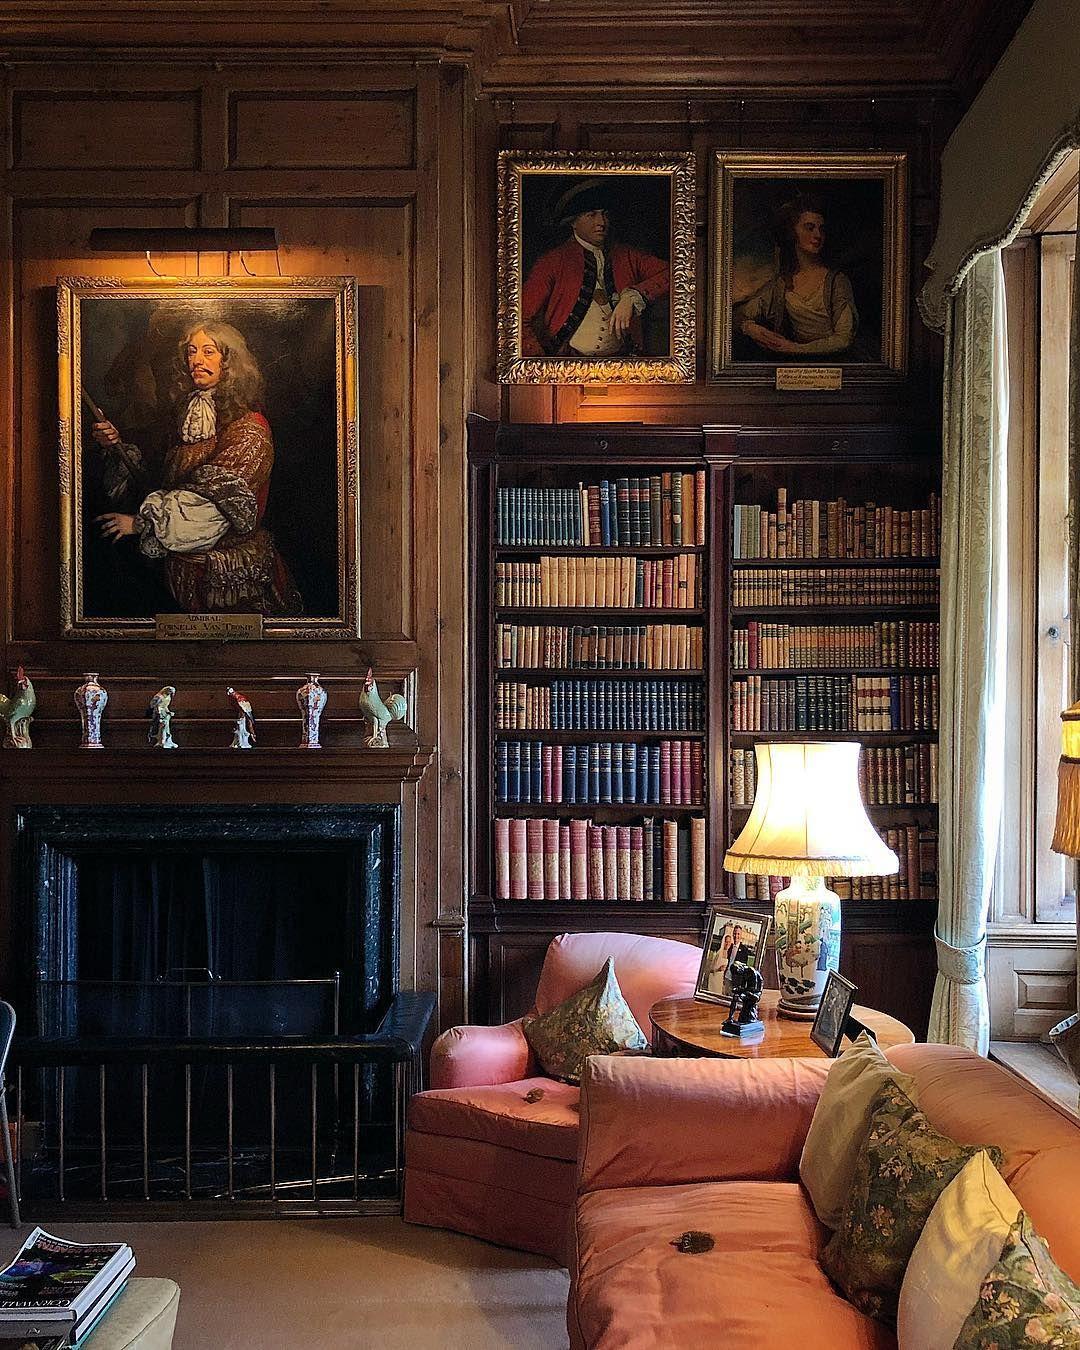 fireside fridaynight interiors panelling paintings library rh pinterest com